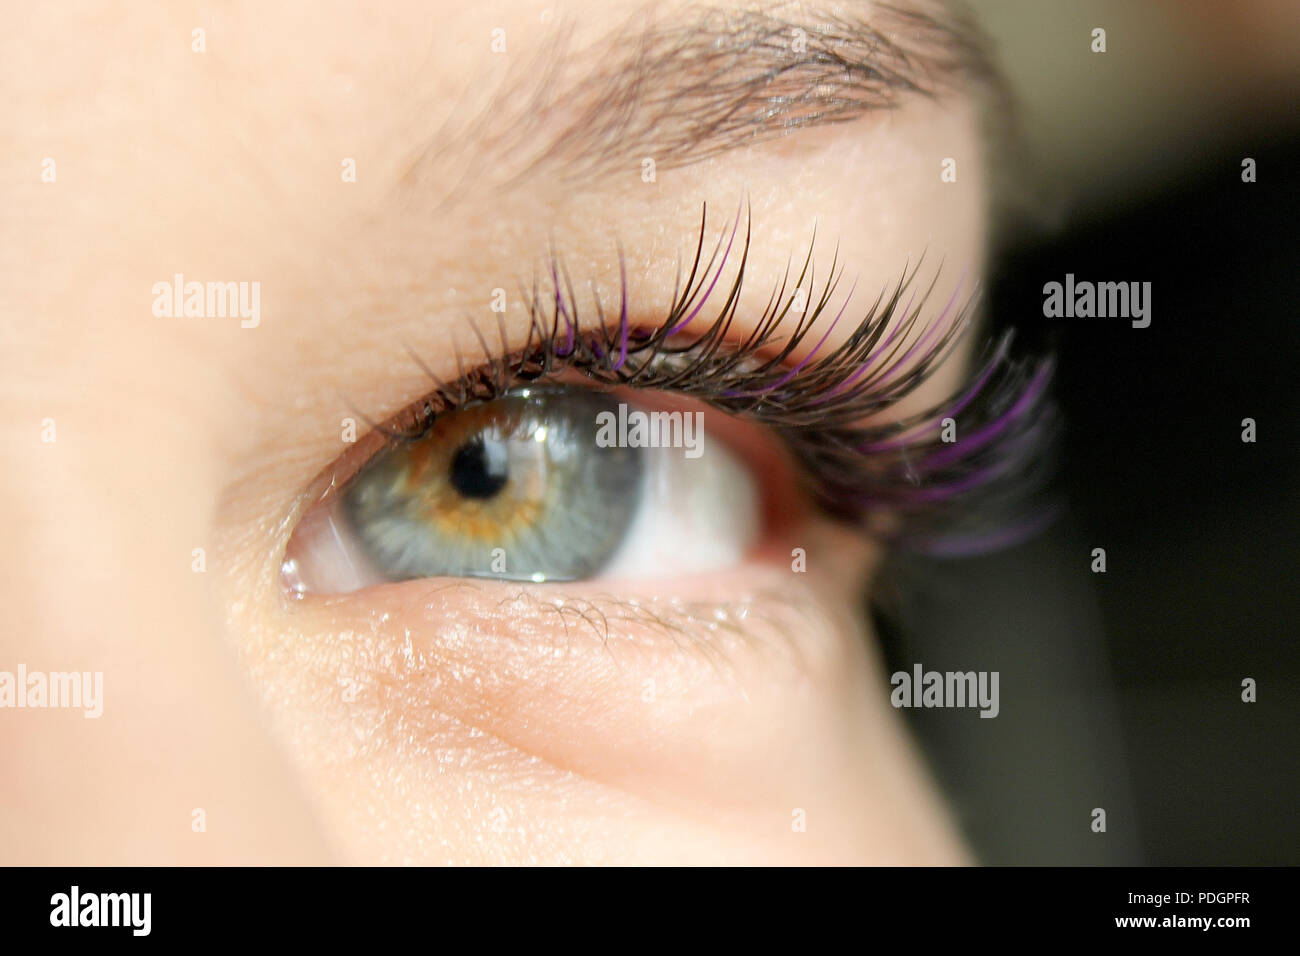 2af6ebfc15e Close up view of beautiful woman eye with long false eyelashes. Eyelash  Extension Procedure.